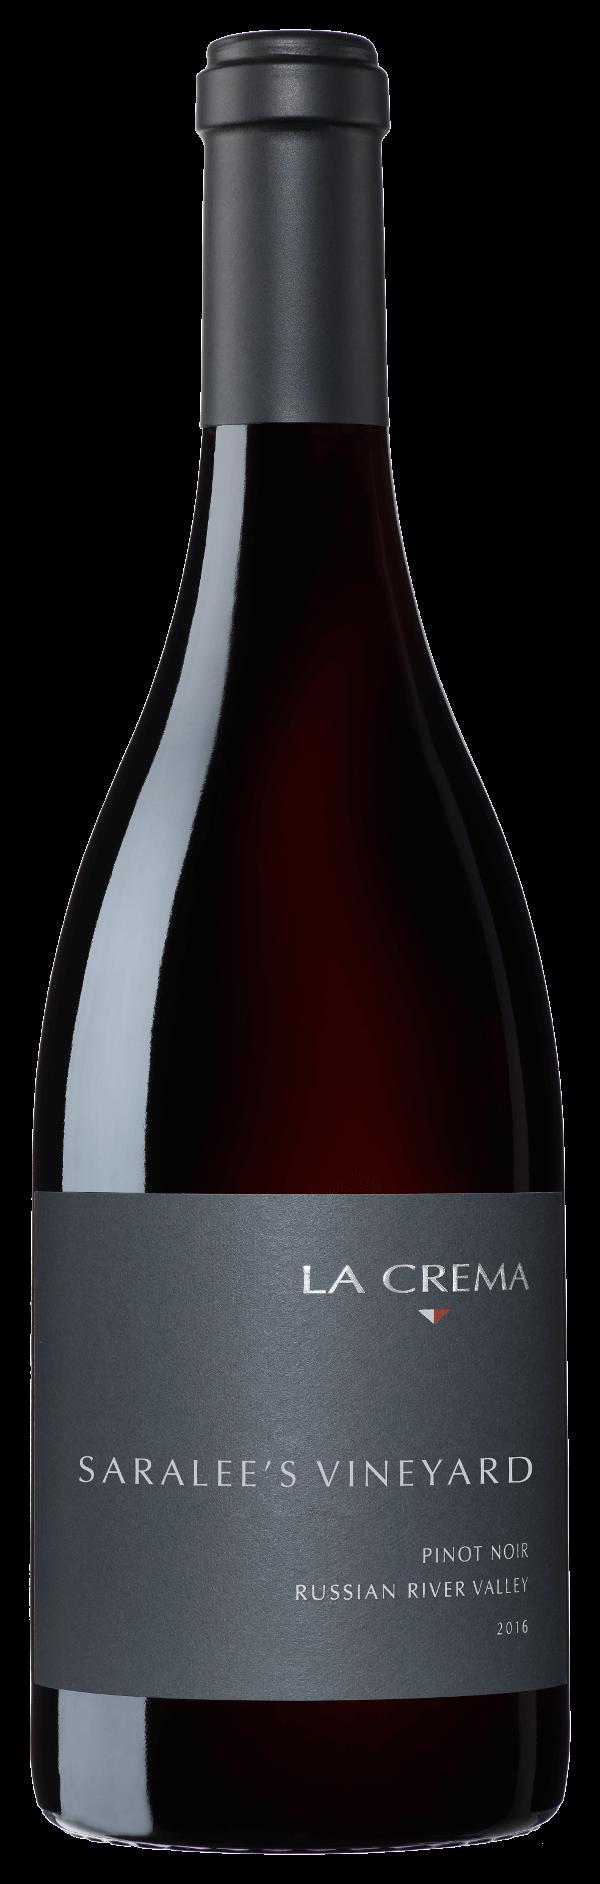 2016 Saralee's Vineyard Pinot Noir